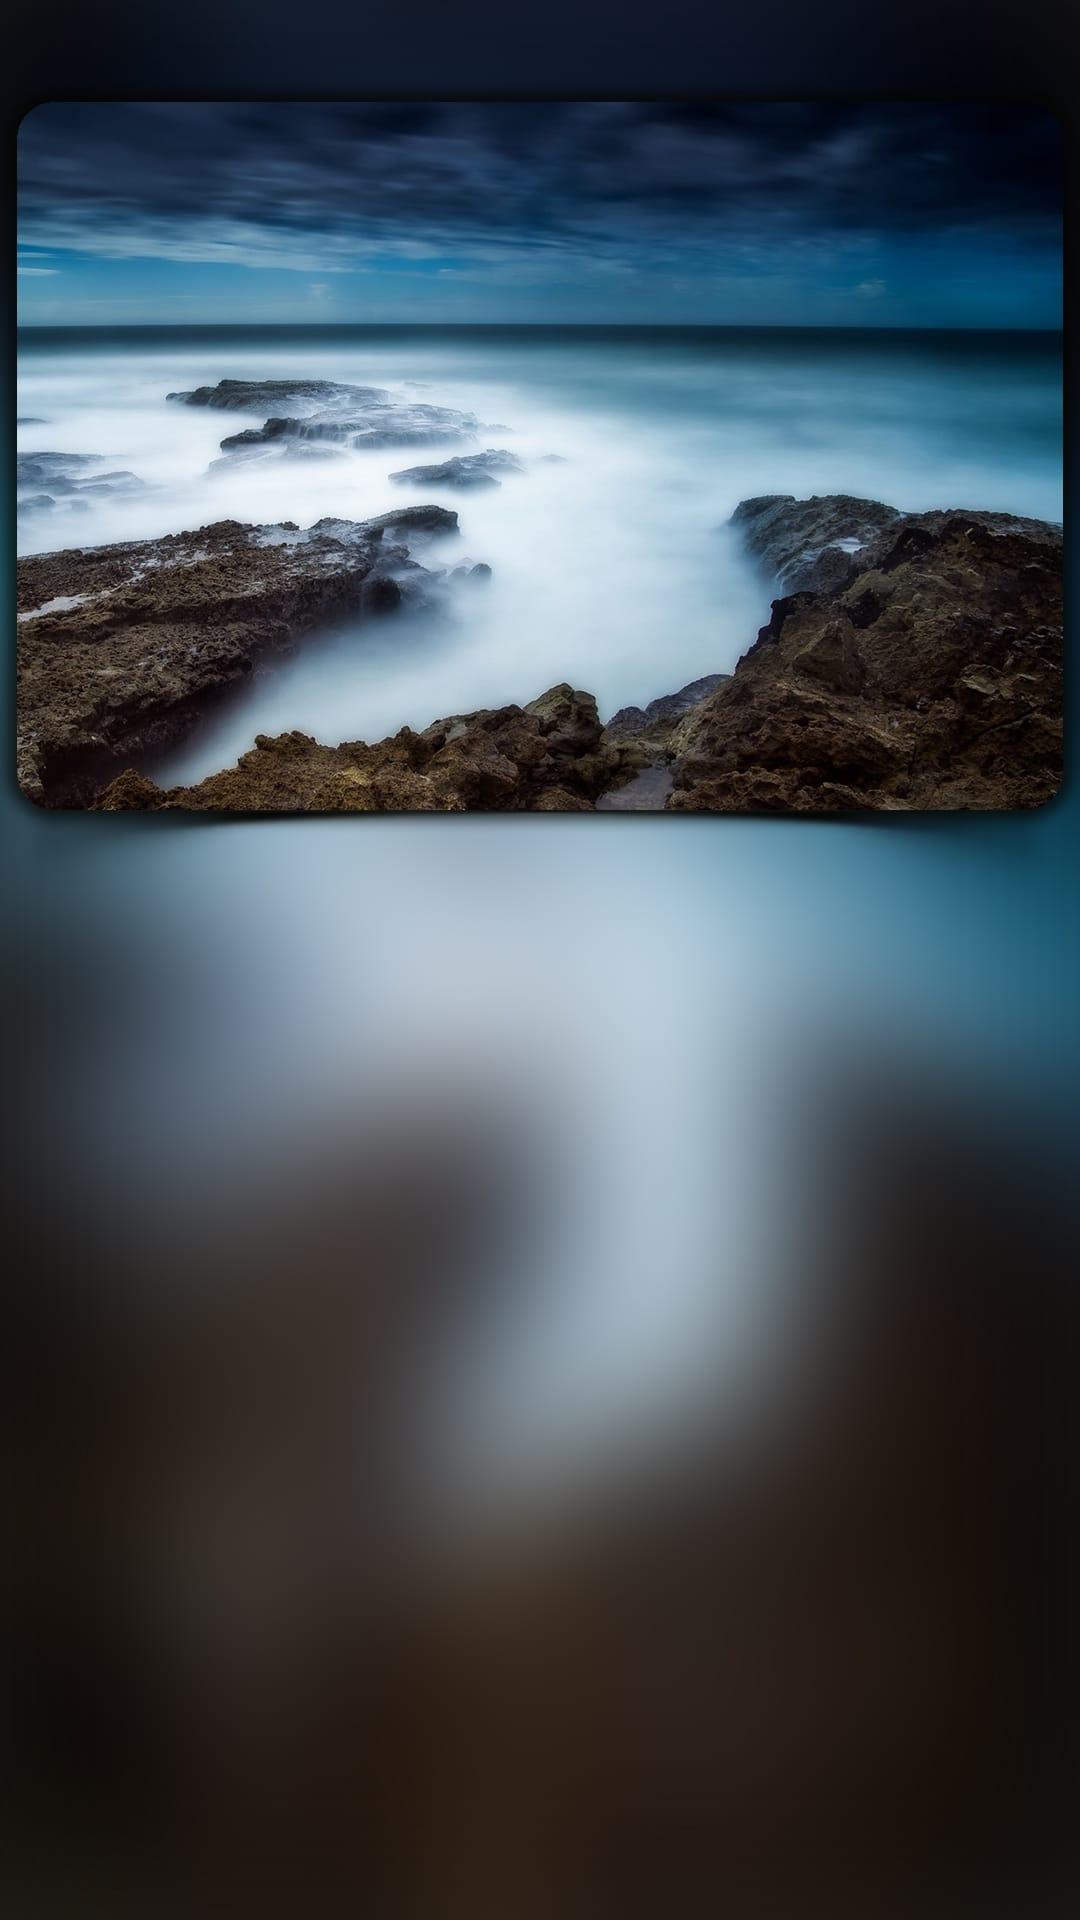 OnePlus 3 3T Hydrogen OS 3.0 Oxygen OS Download